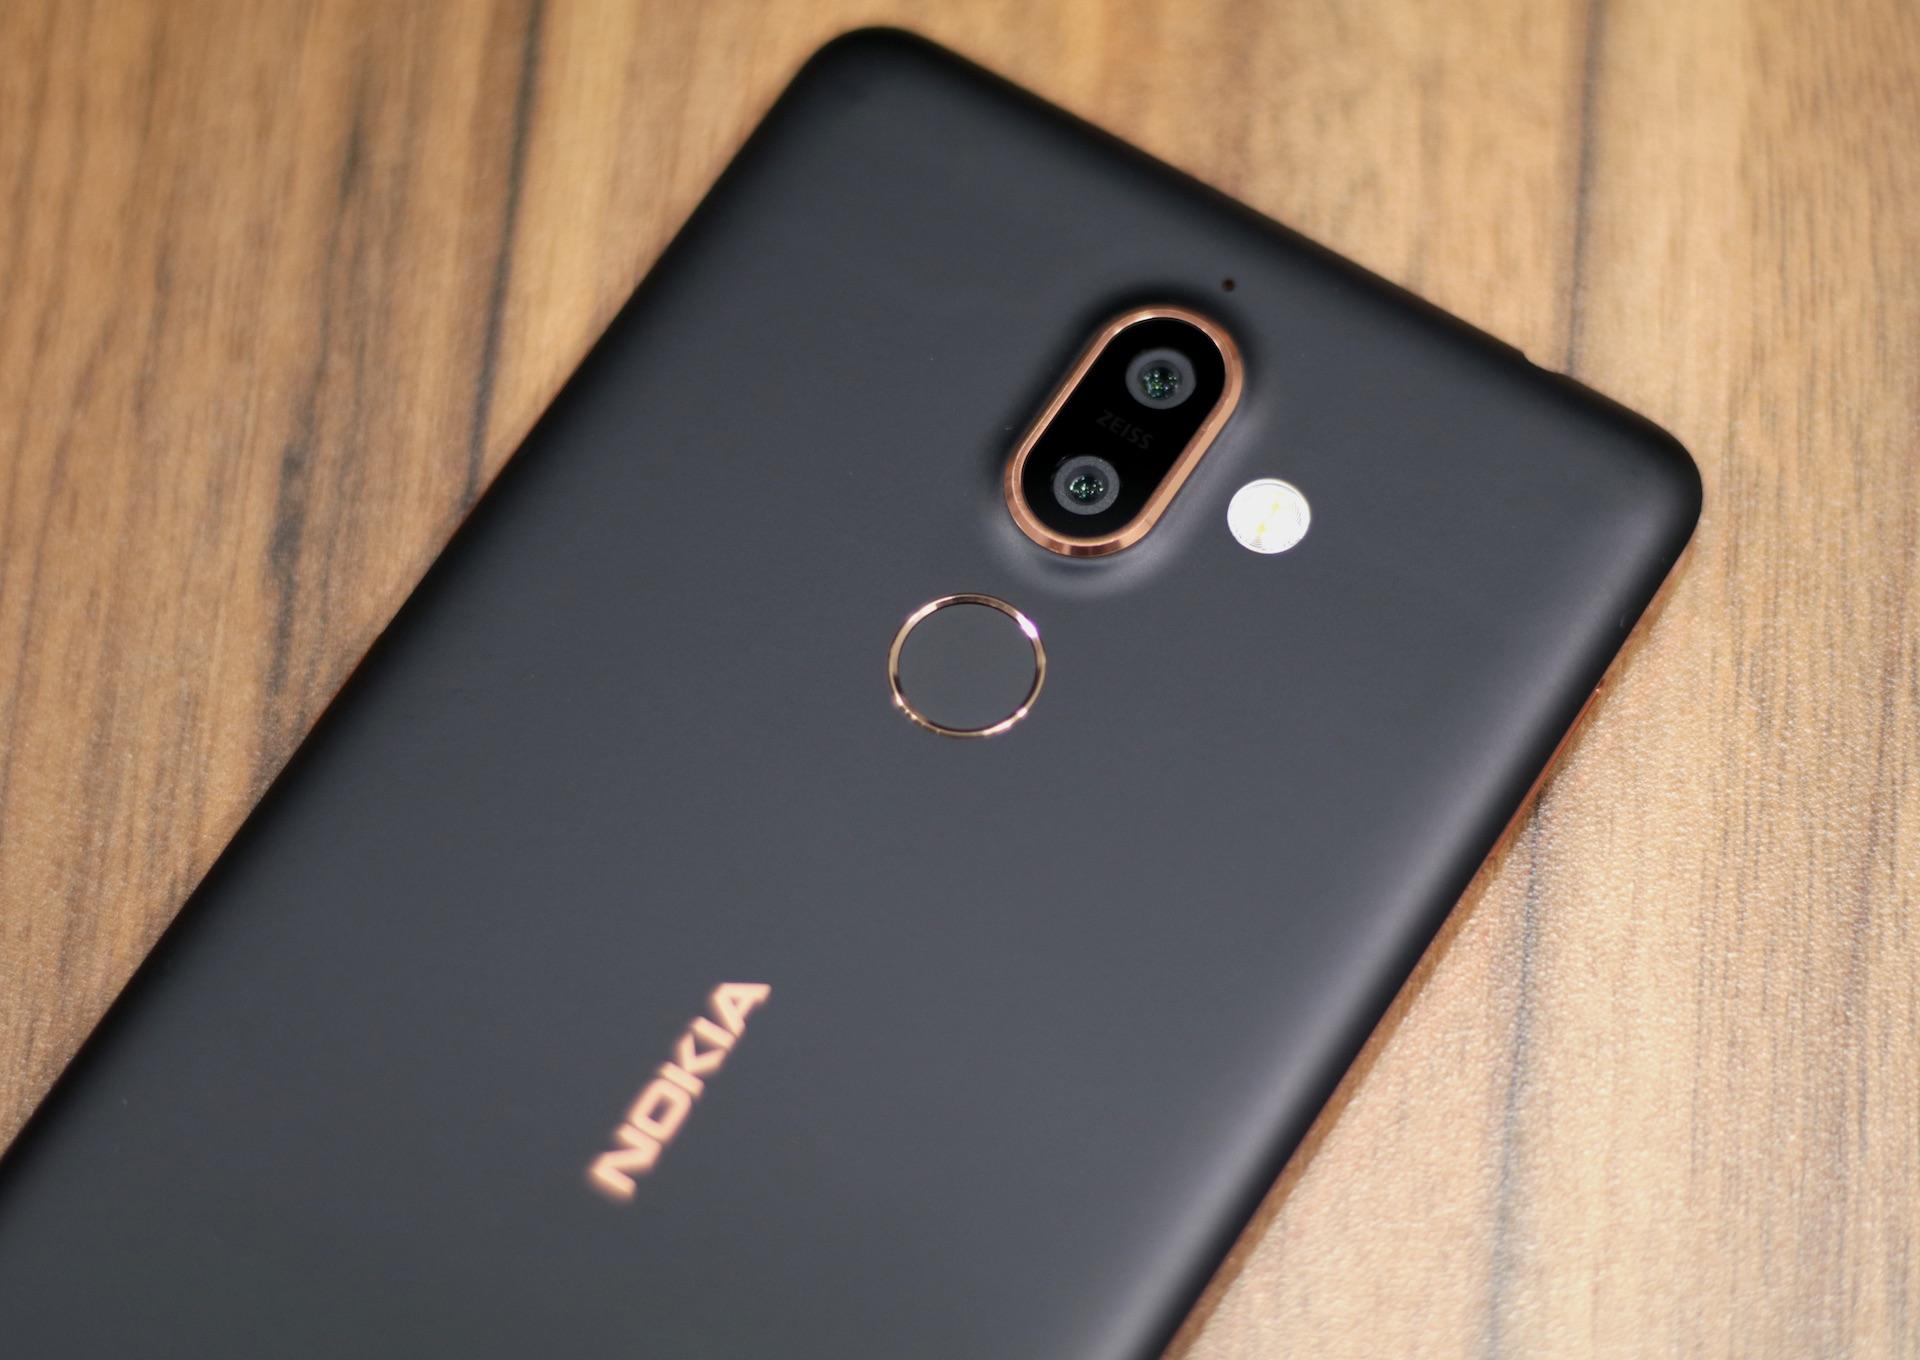 Nokia 7 Plus Miglior Prezzo